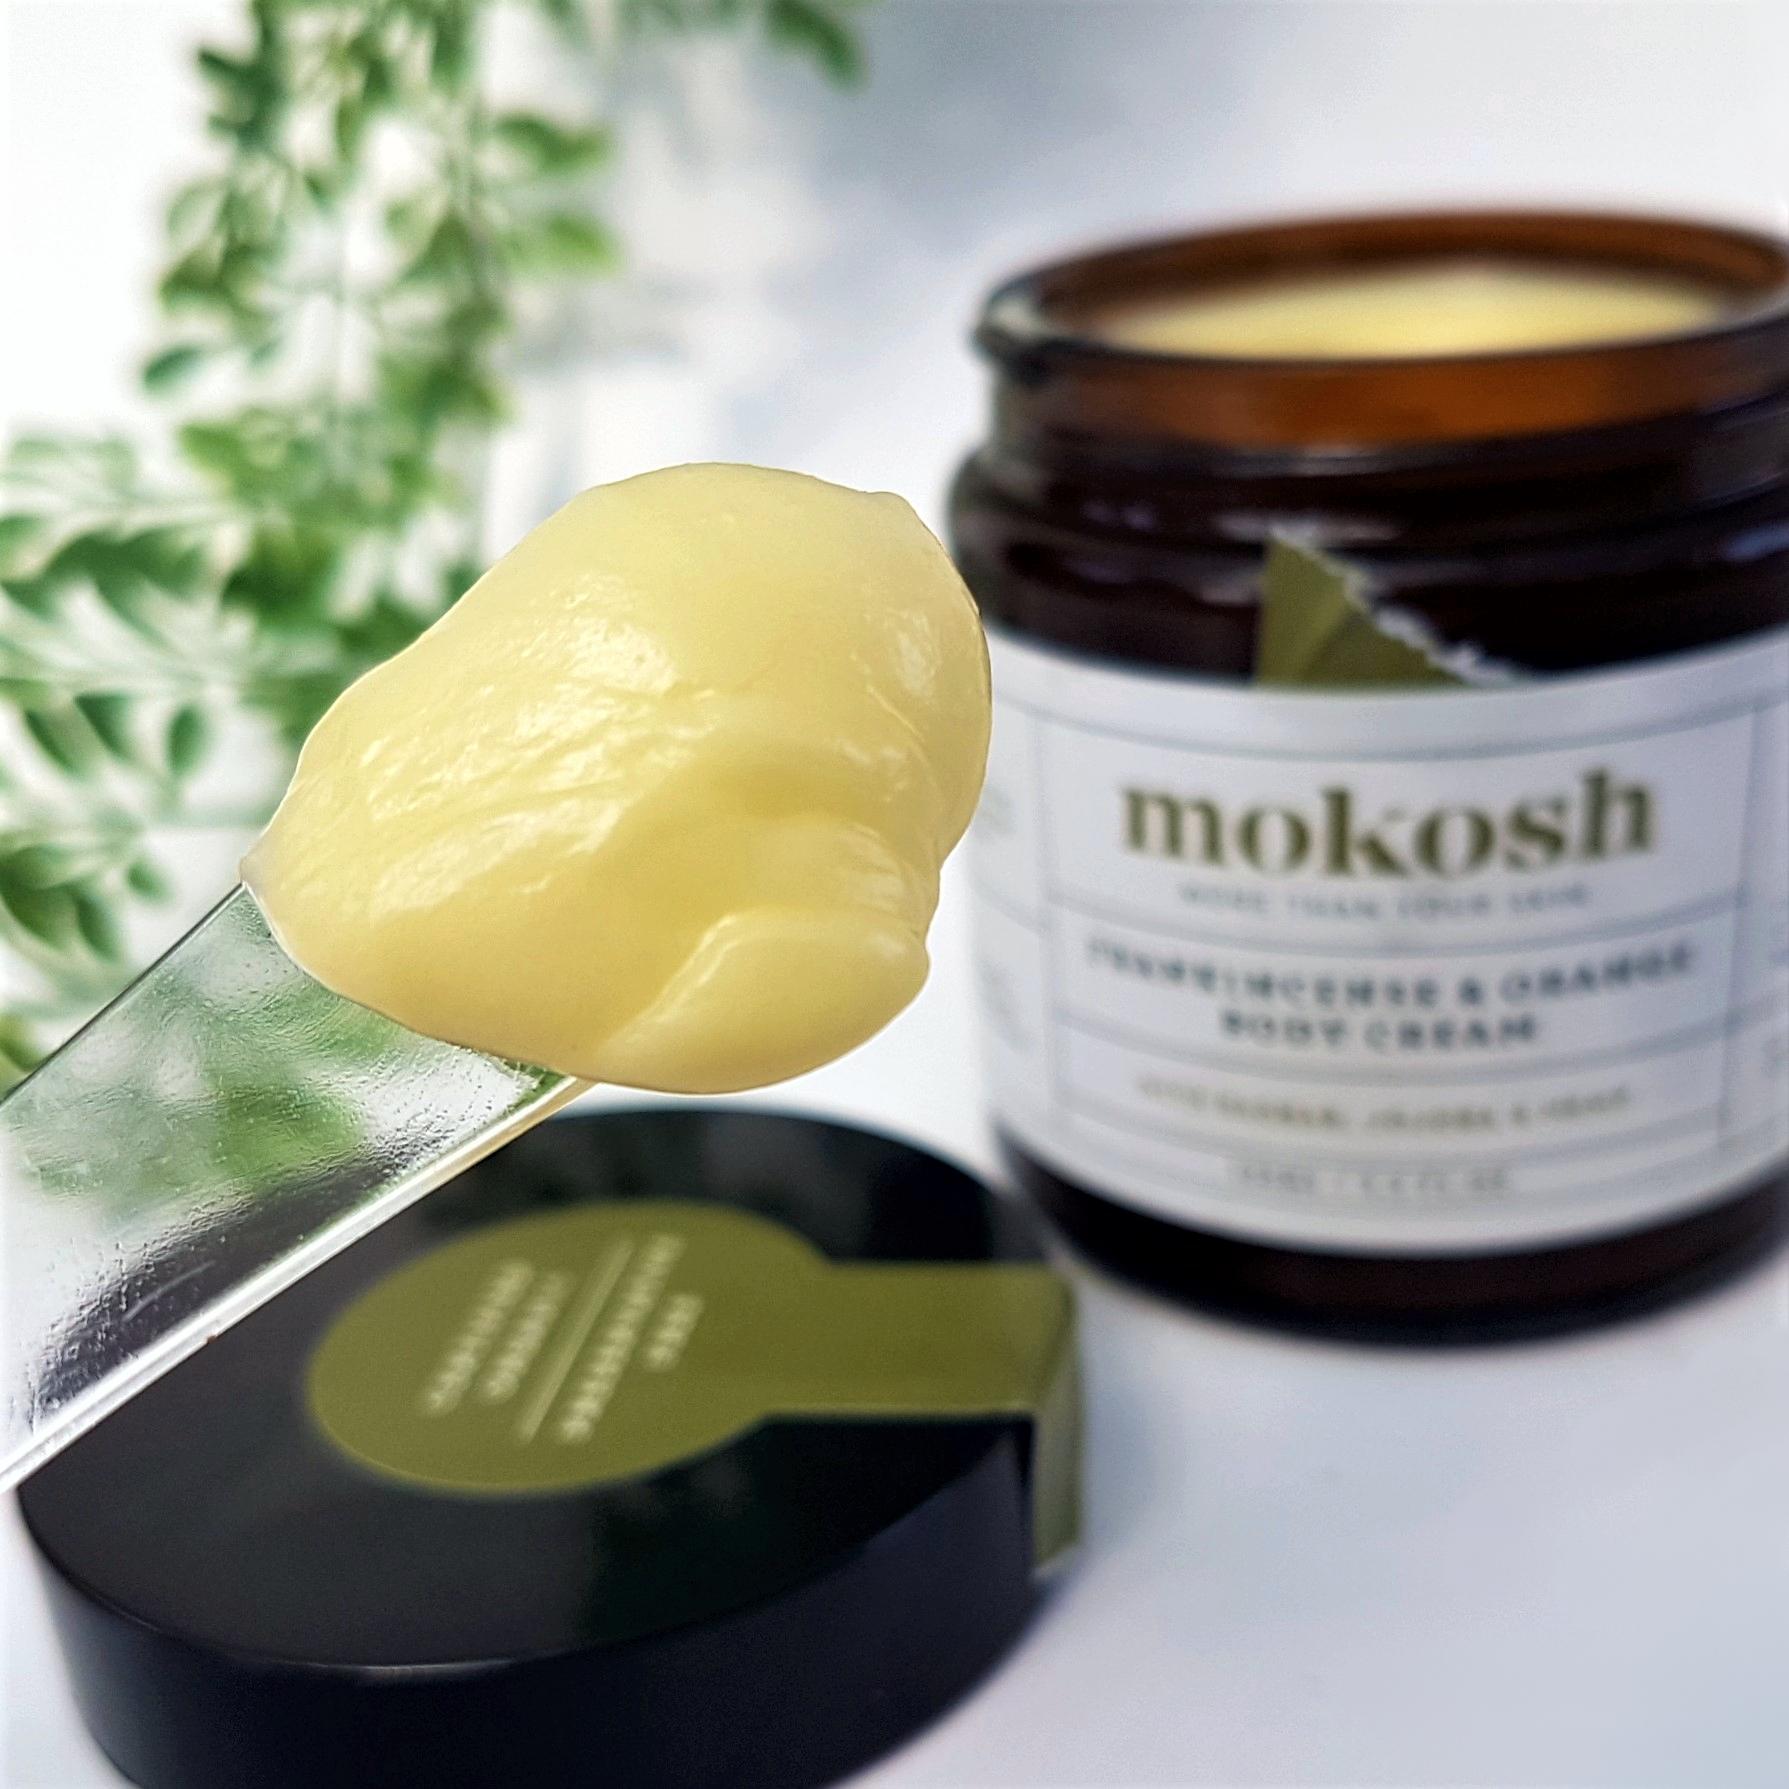 Frankincense & Orange Body Cream Texture